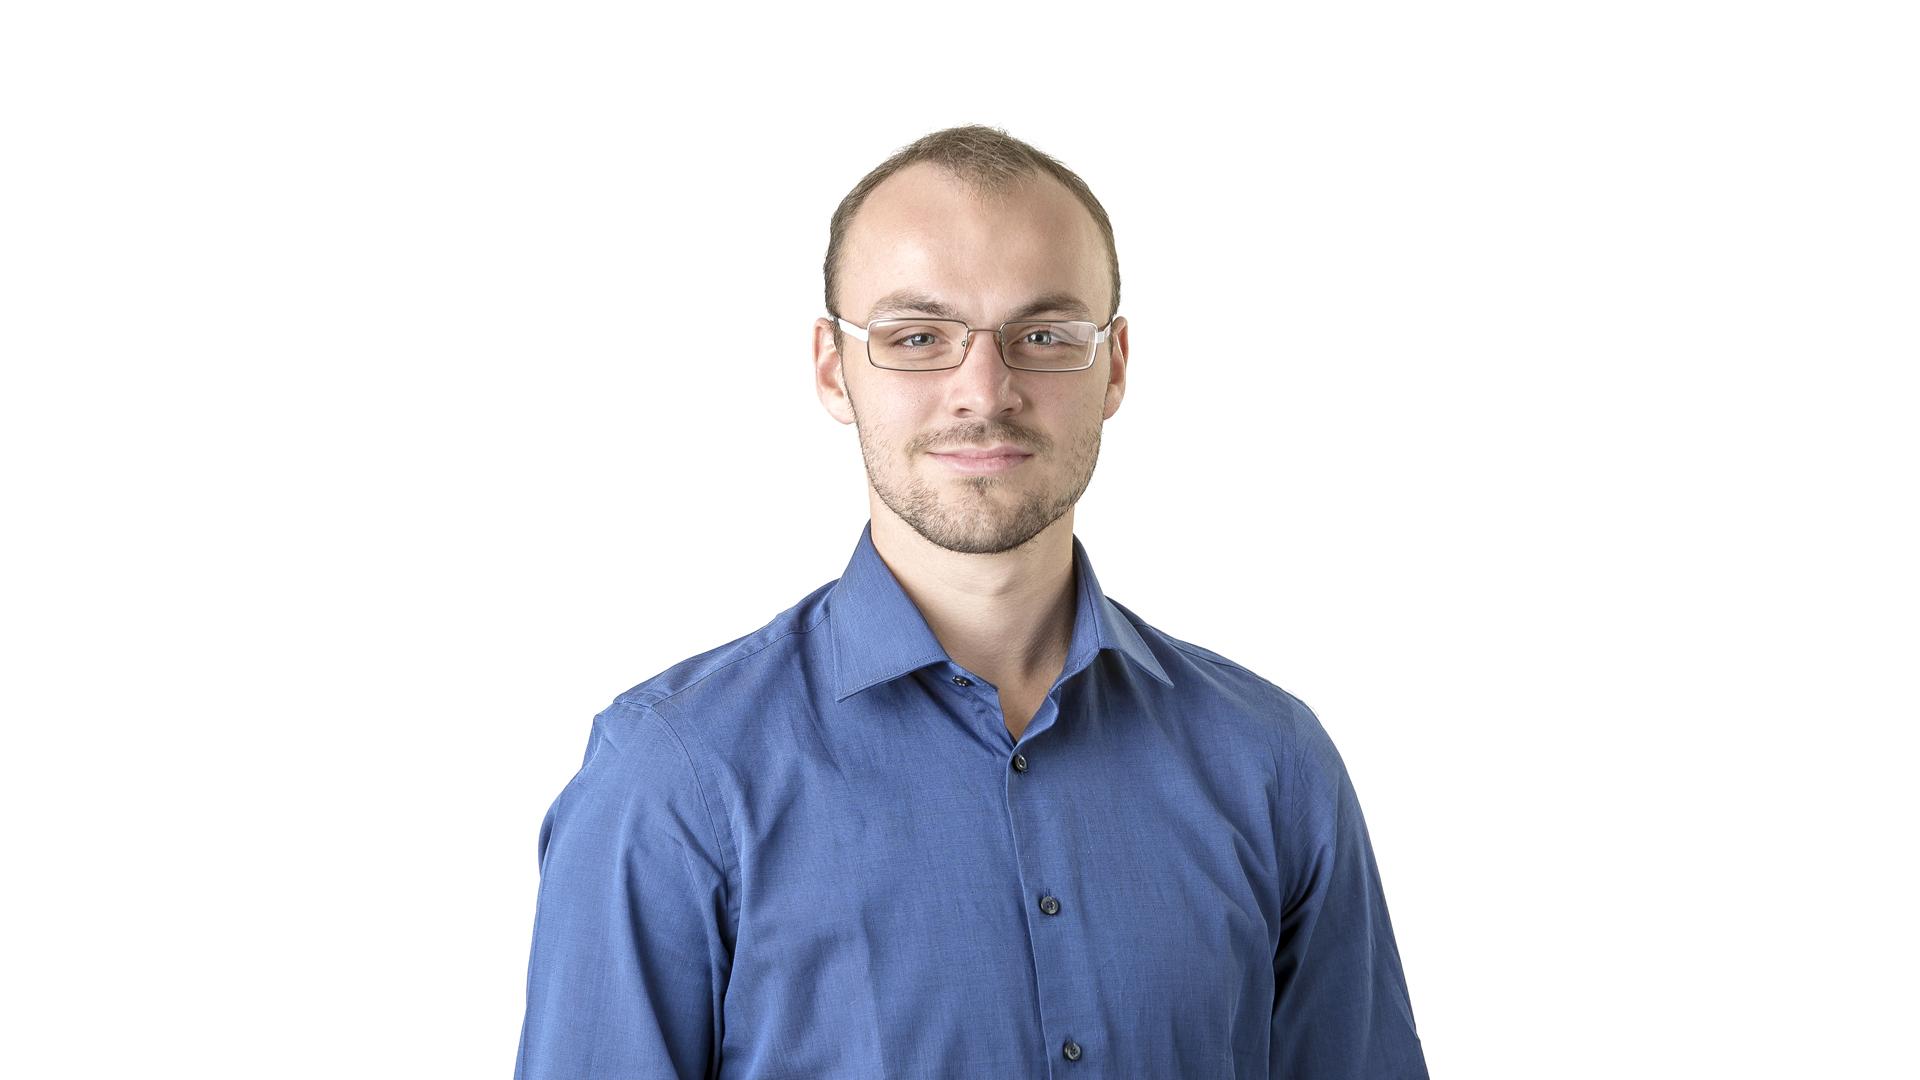 Jakub Inger